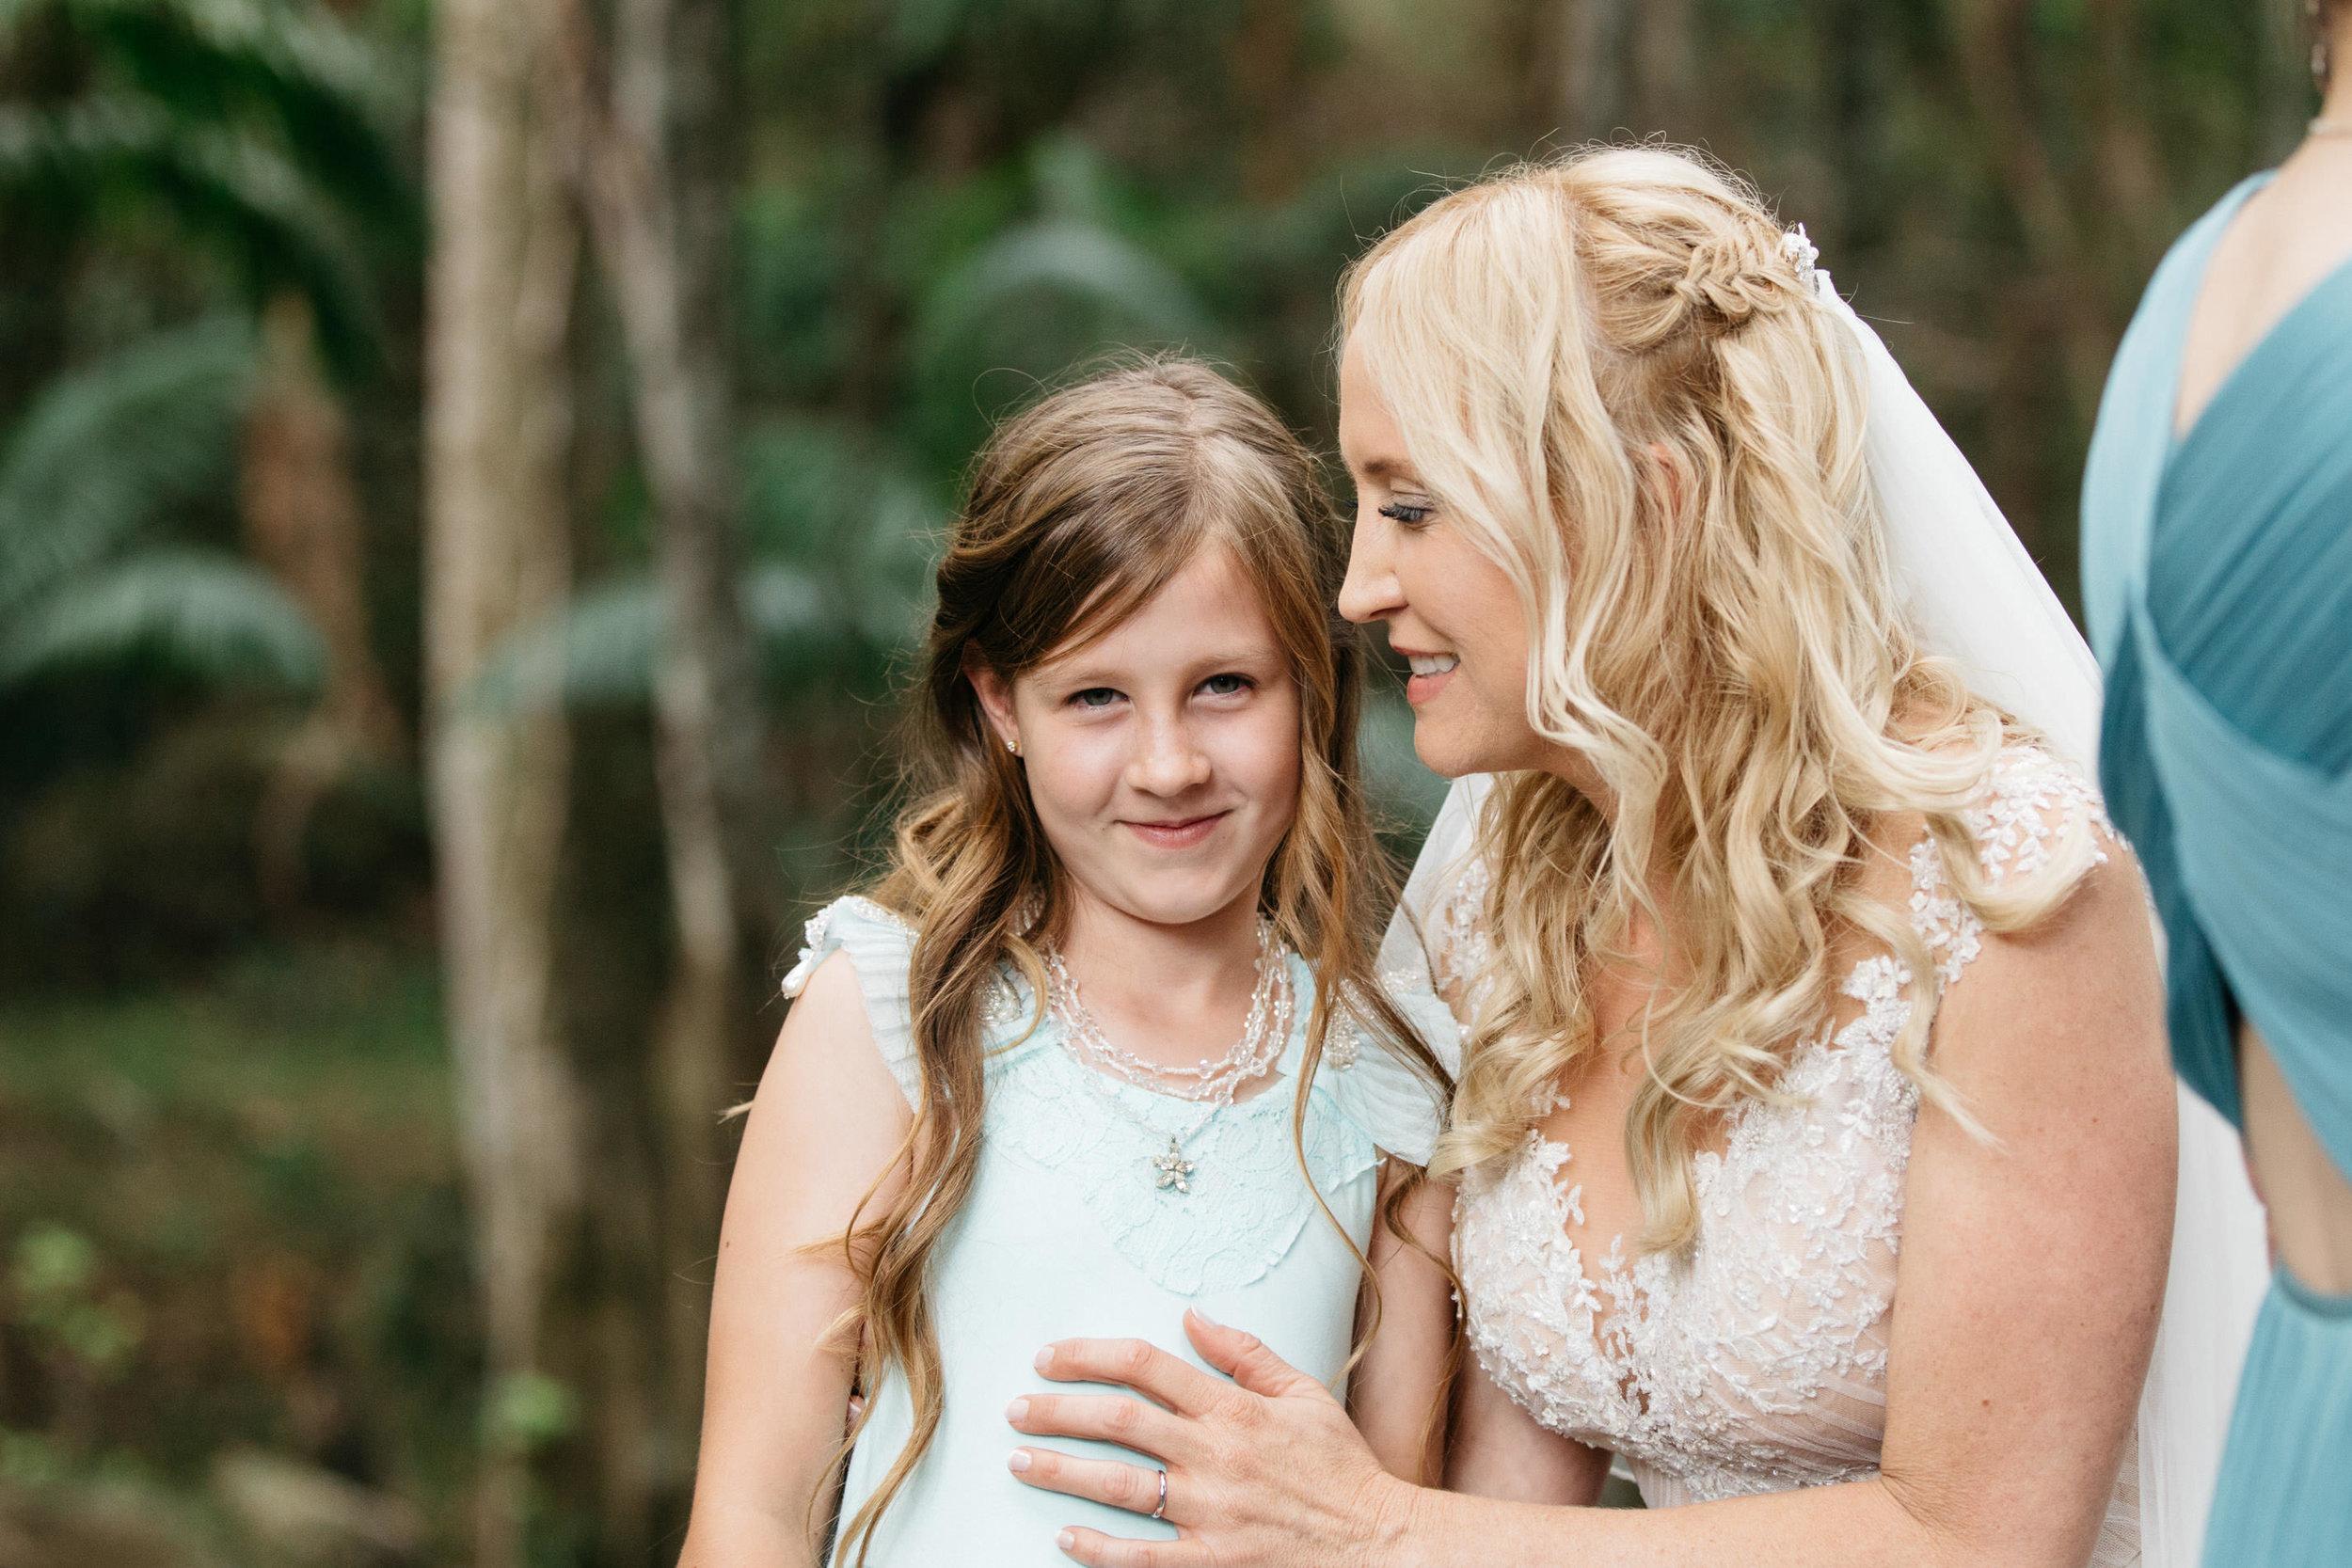 True North Photography_Boomerang Farm_Stacey and Isaac_Gold Coast Wedding_Barm Wedding_Hinterland Wedding-106.jpg